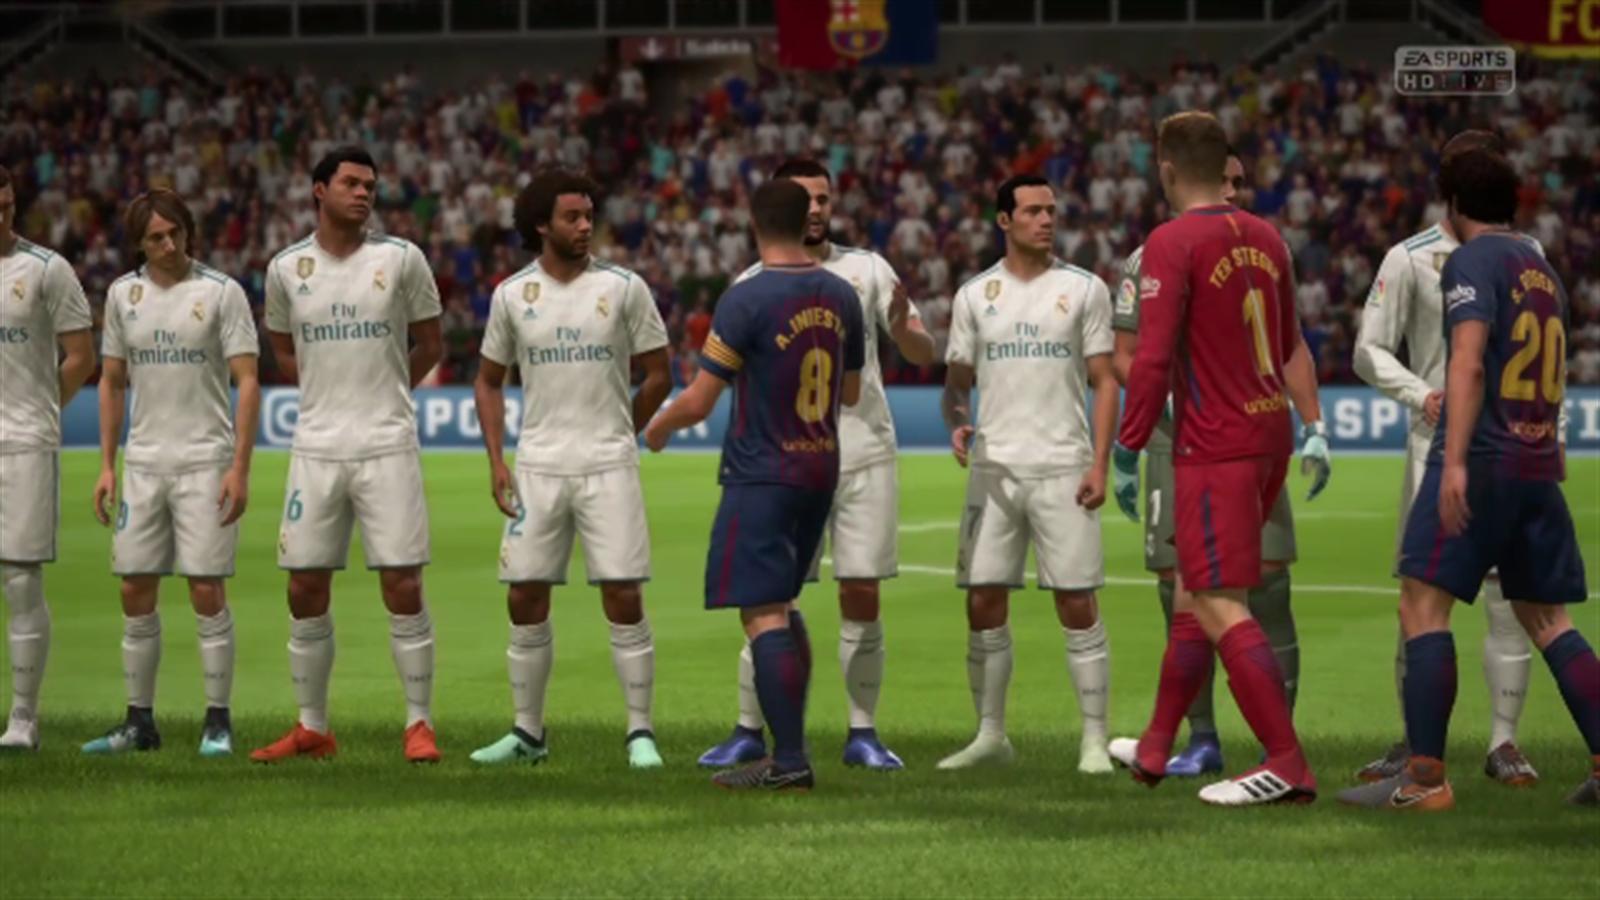 06dc9ac9c0271 En directo   LIVE FC Barcelona - Real Madrid - La Liga - 6 mayo 2018 -  Eurosport Espana